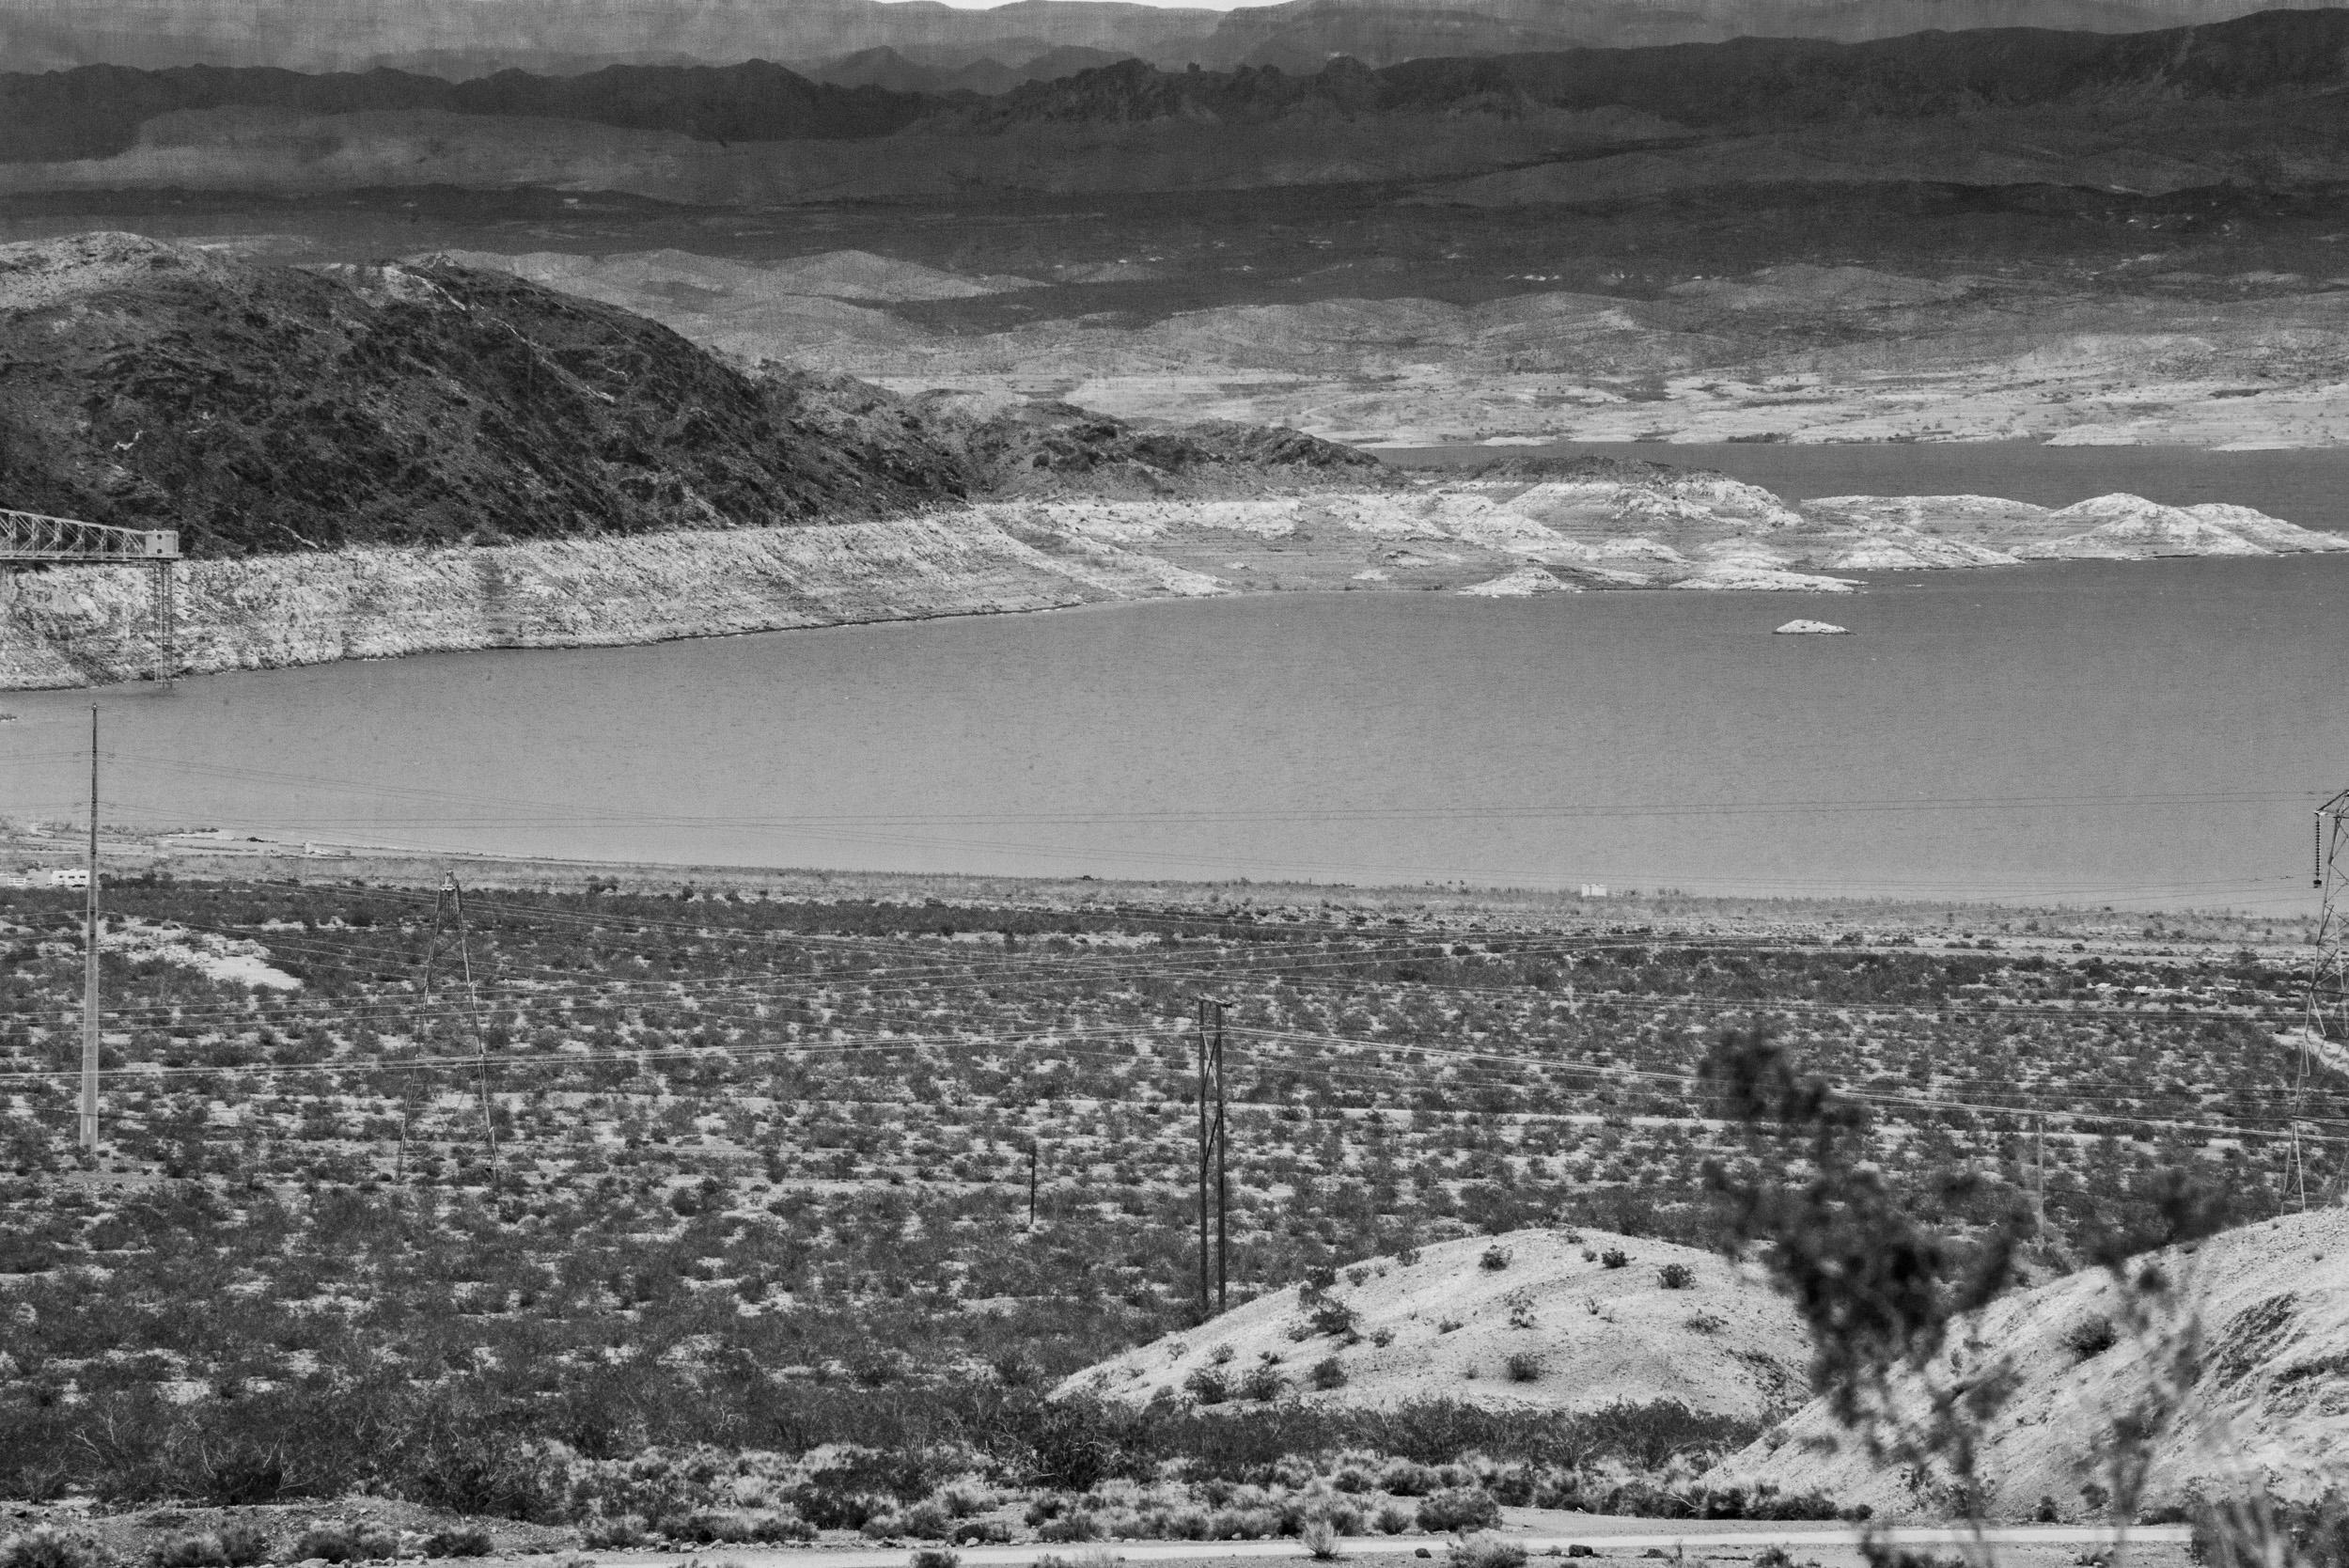 Near Hover Dam, Nevada © Robert Welkie 2017